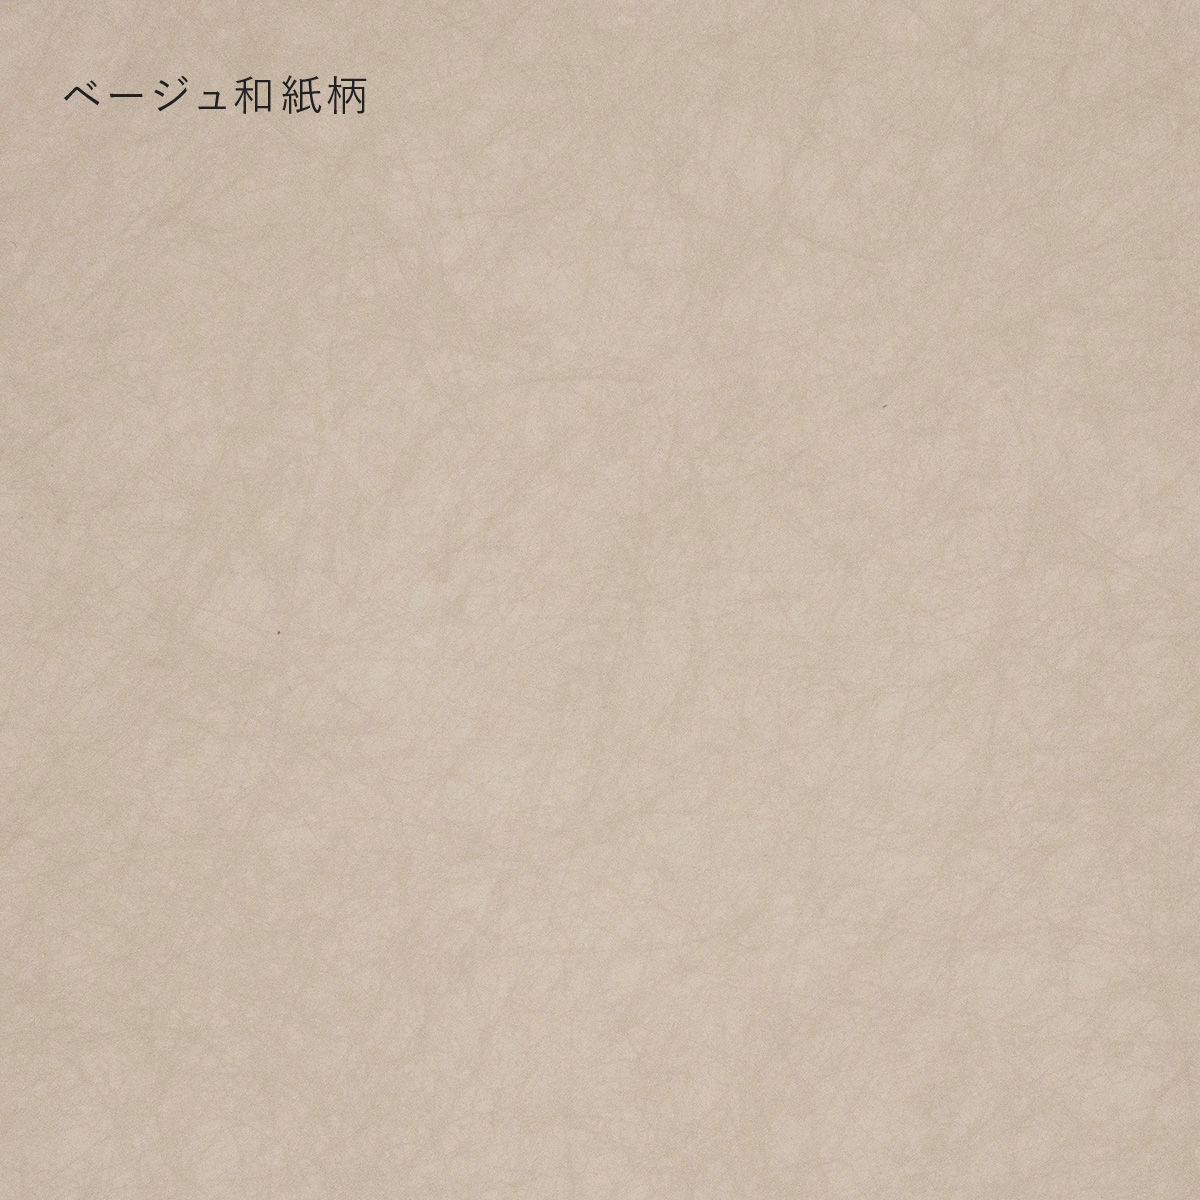 【V-TISS LIGHT】 引出しセット